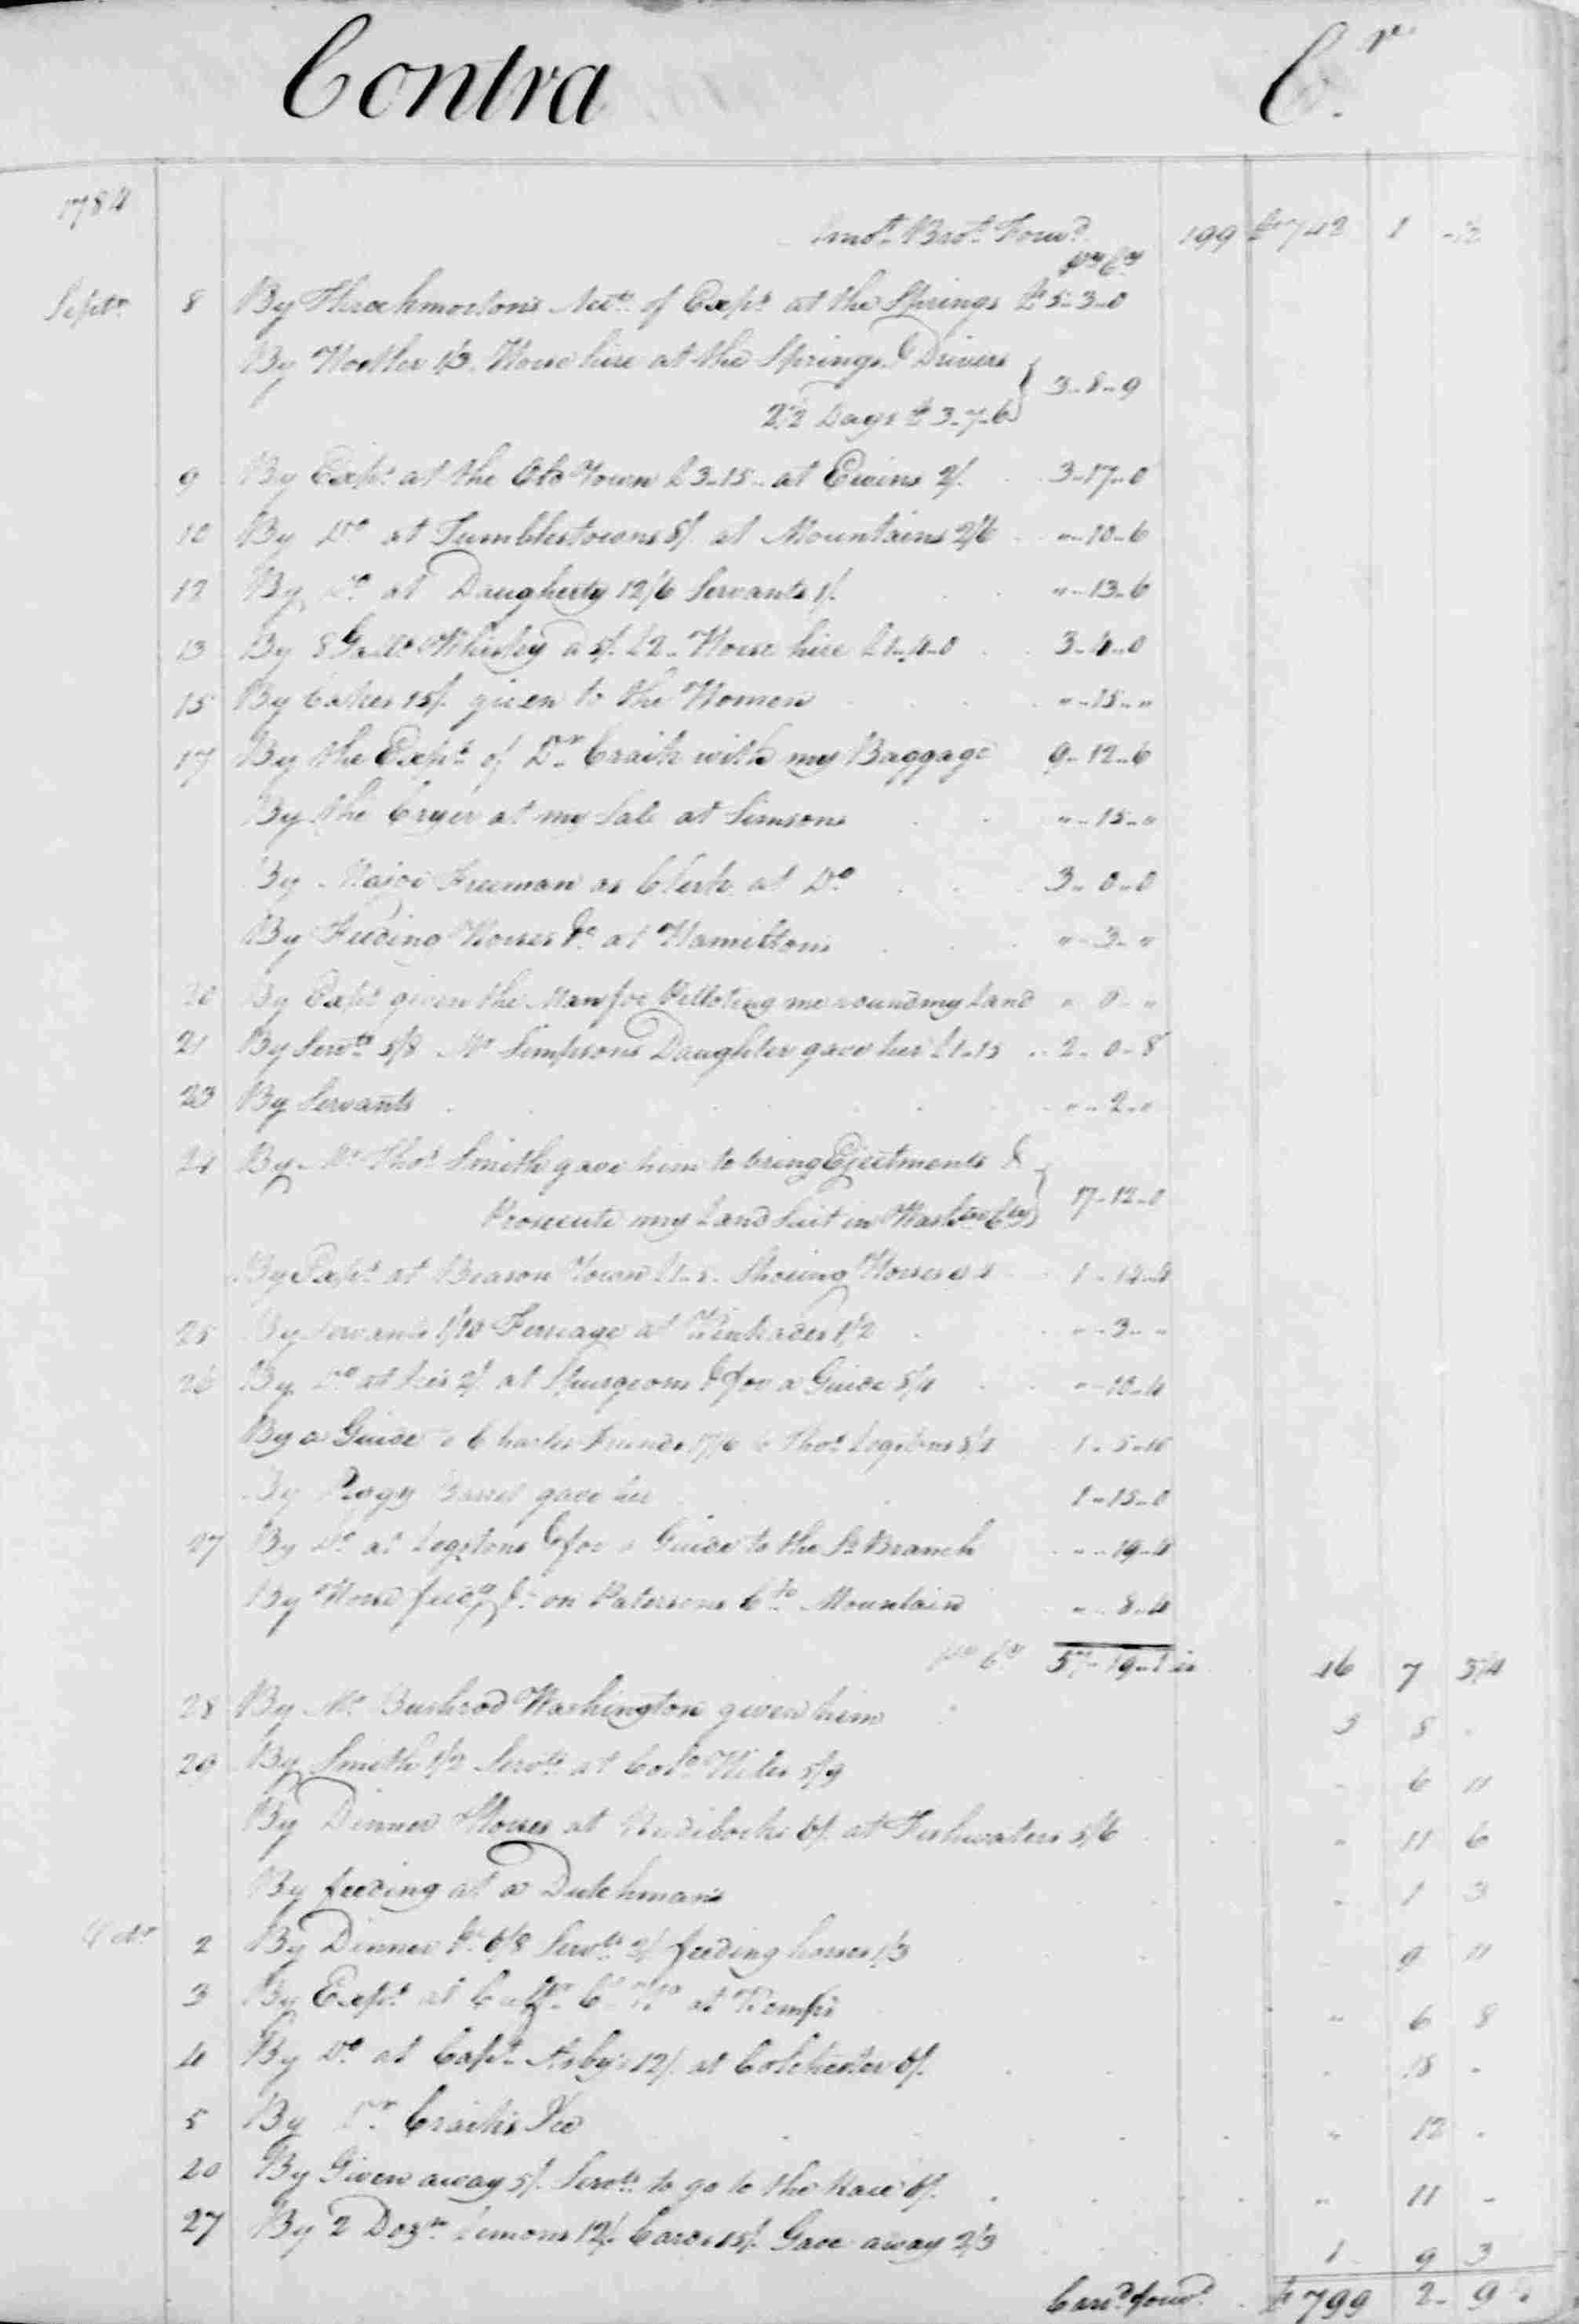 Ledger B, folio 200, right side